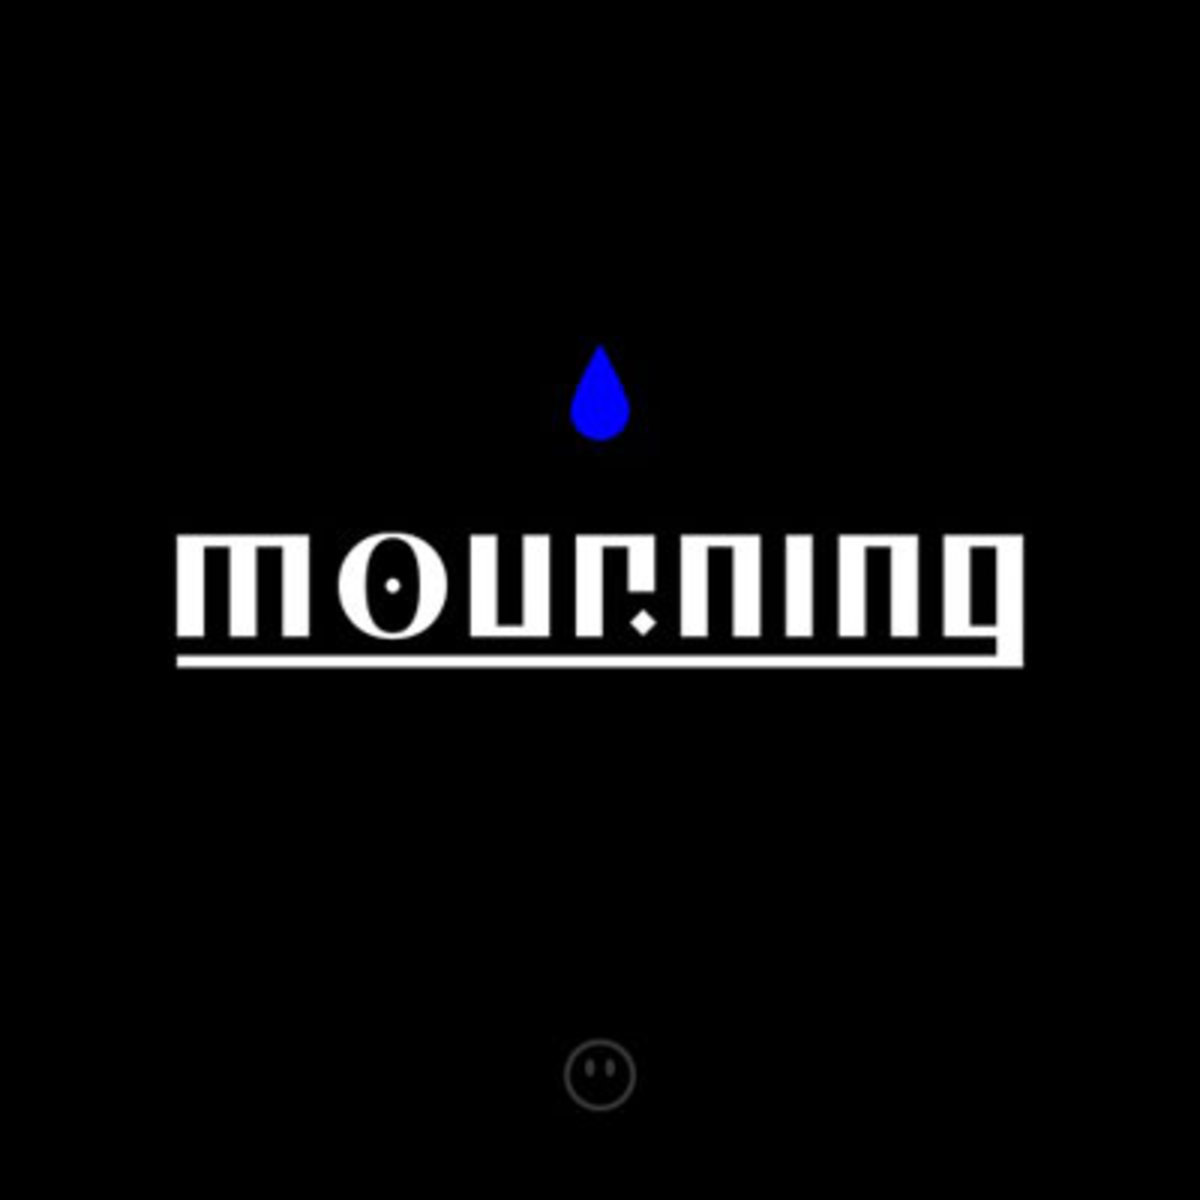 gautier-mourning.jpg